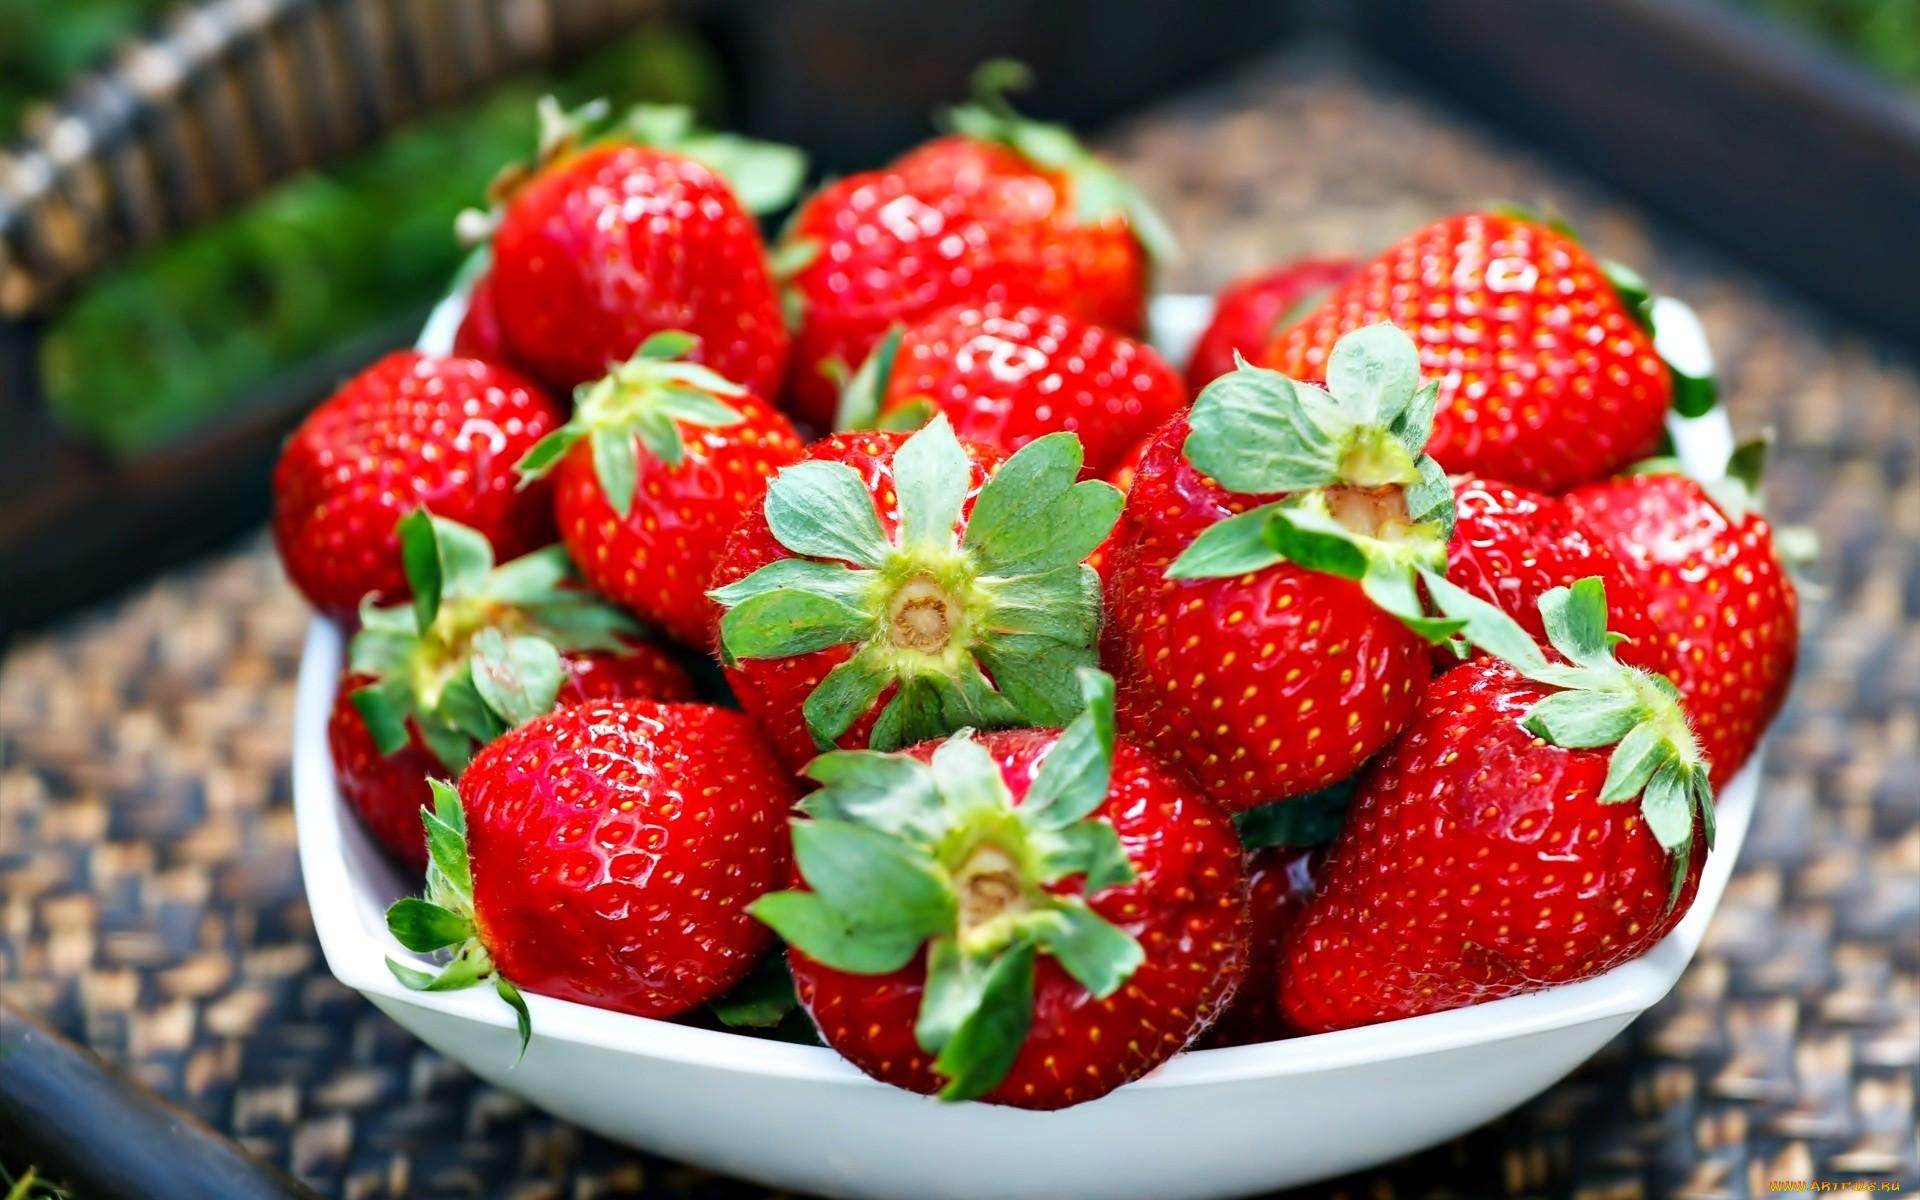 фото ягодки клубники заболеванием